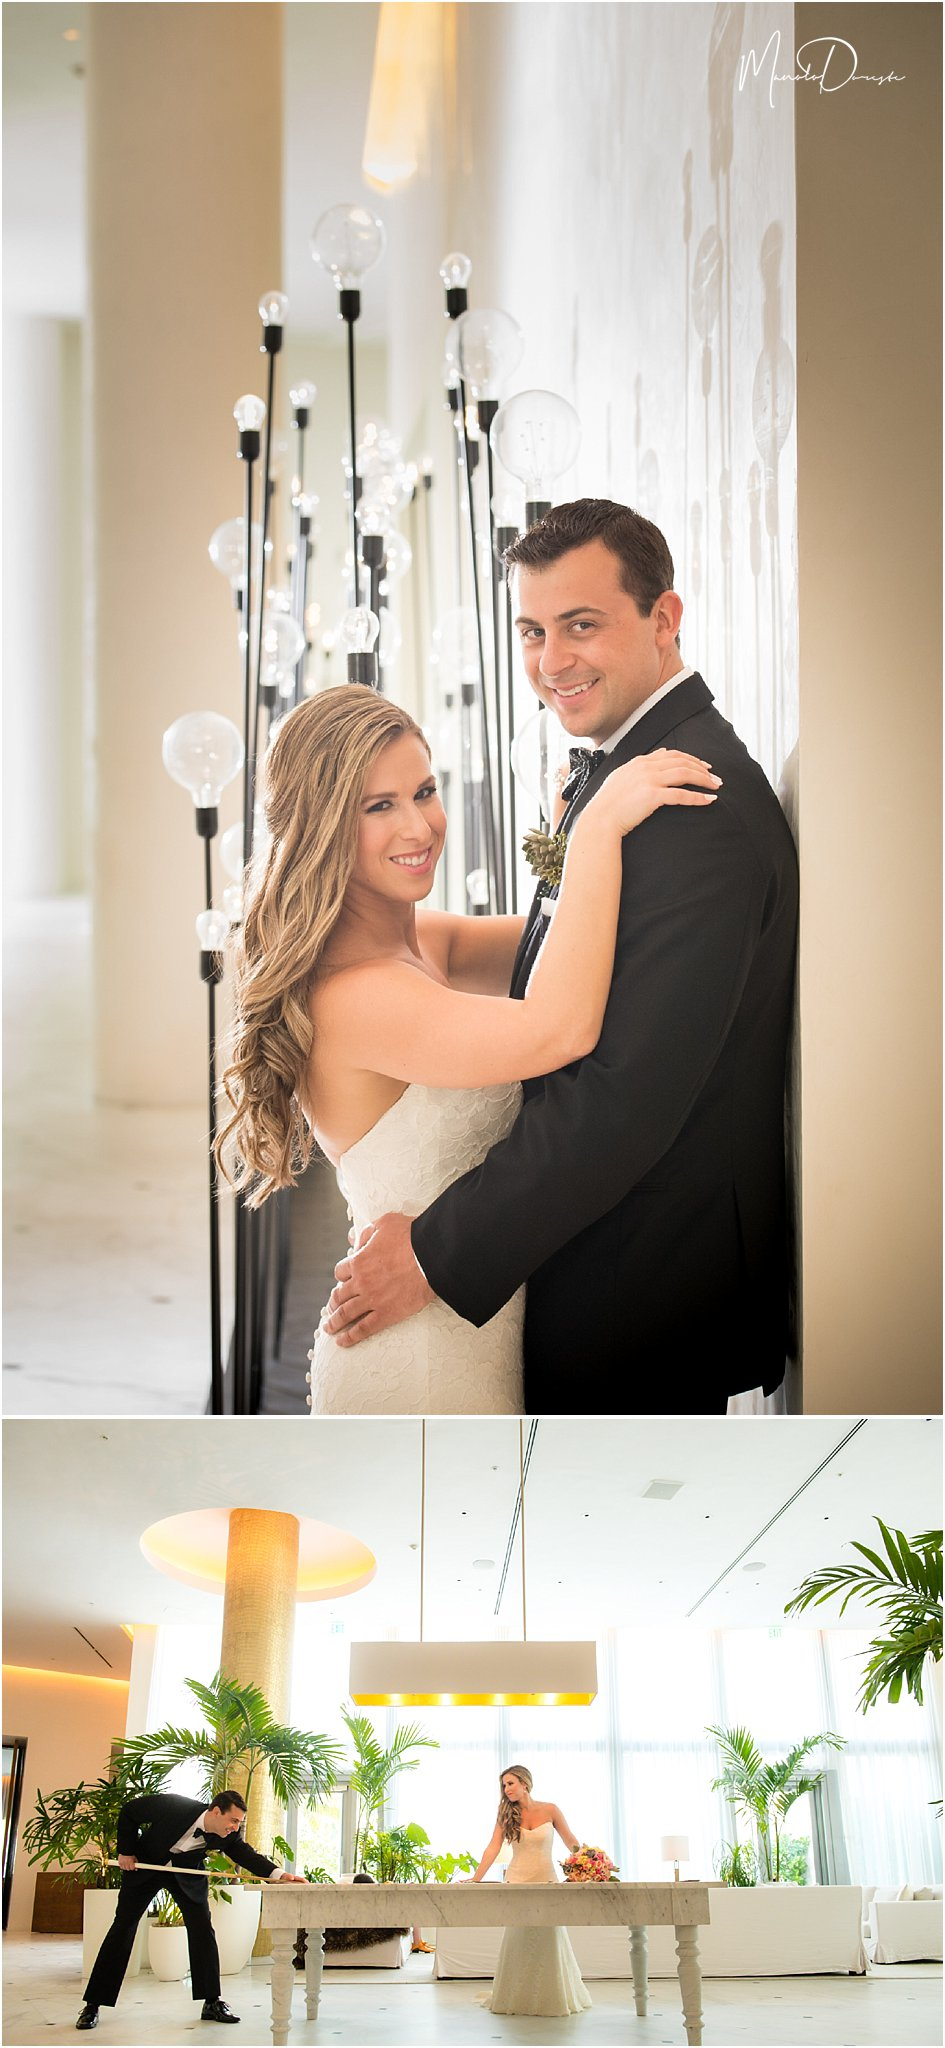 0664_ManoloDoreste_InFocusStudios_Wedding_Family_Photography_Miami_MiamiPhotographer.jpg